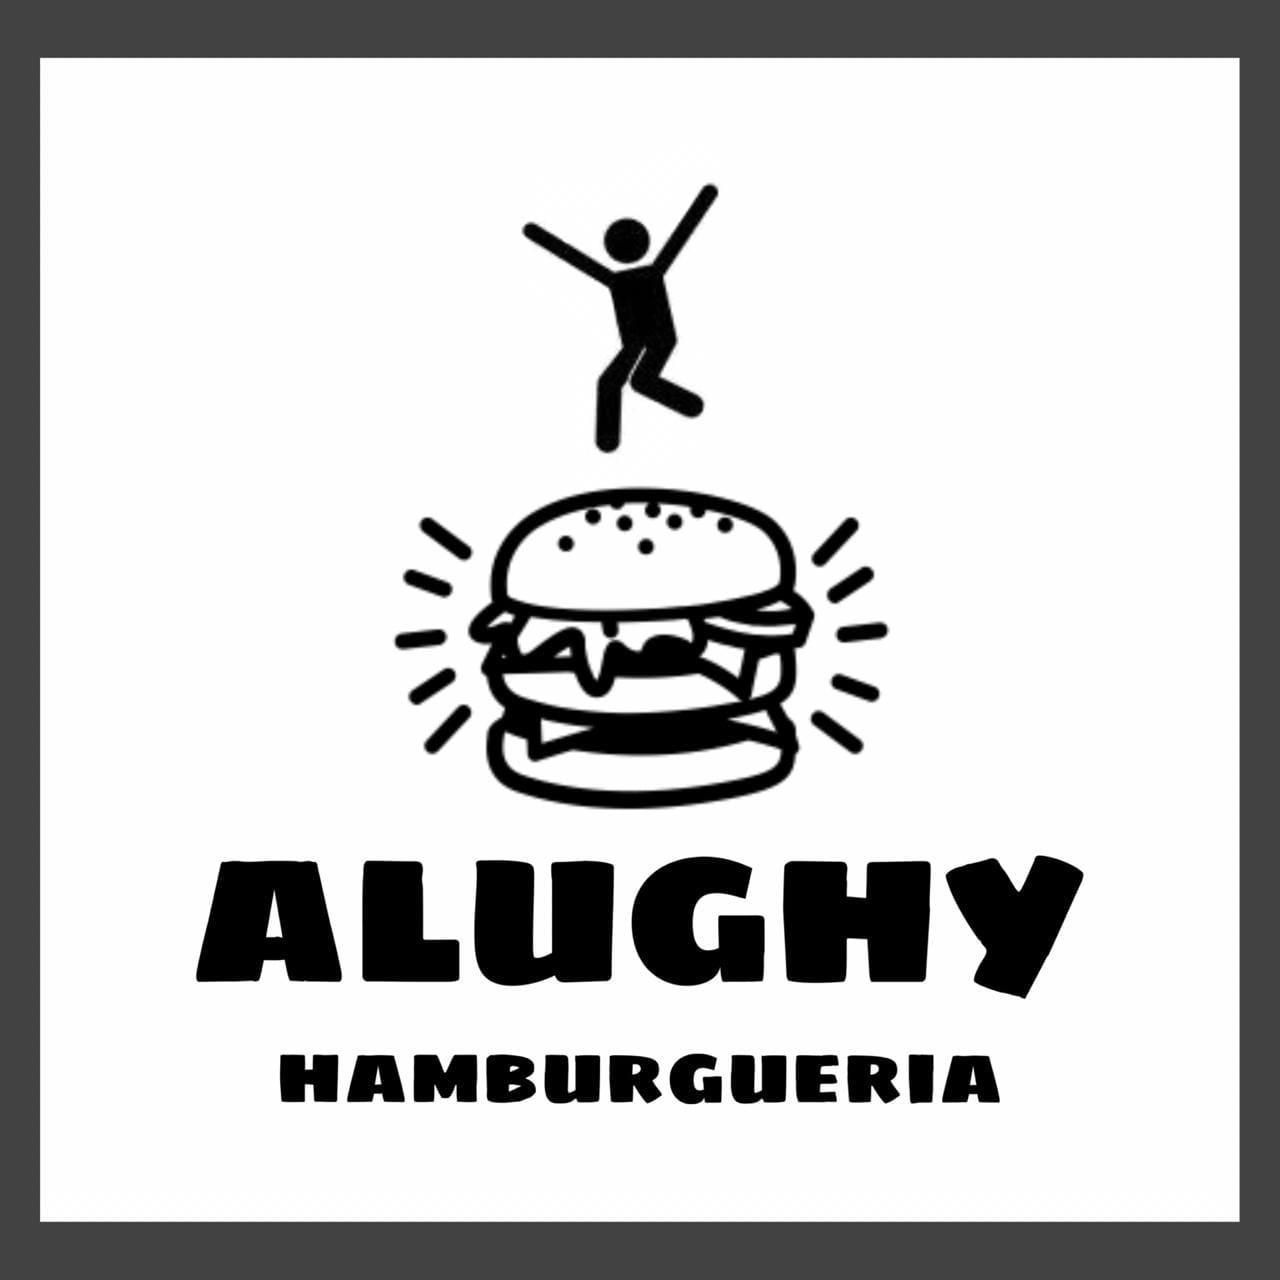 Alughy Hamburgueria